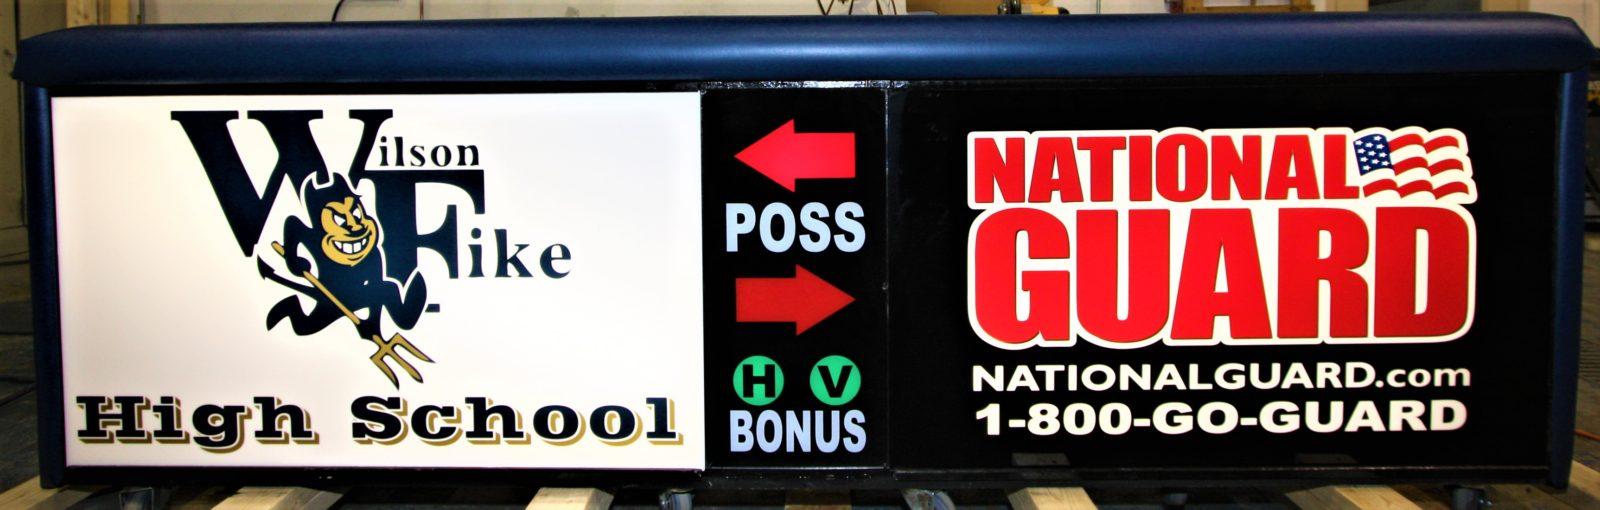 Wilson Fike high school scoring table North Carolina Army National Guard NCARNG